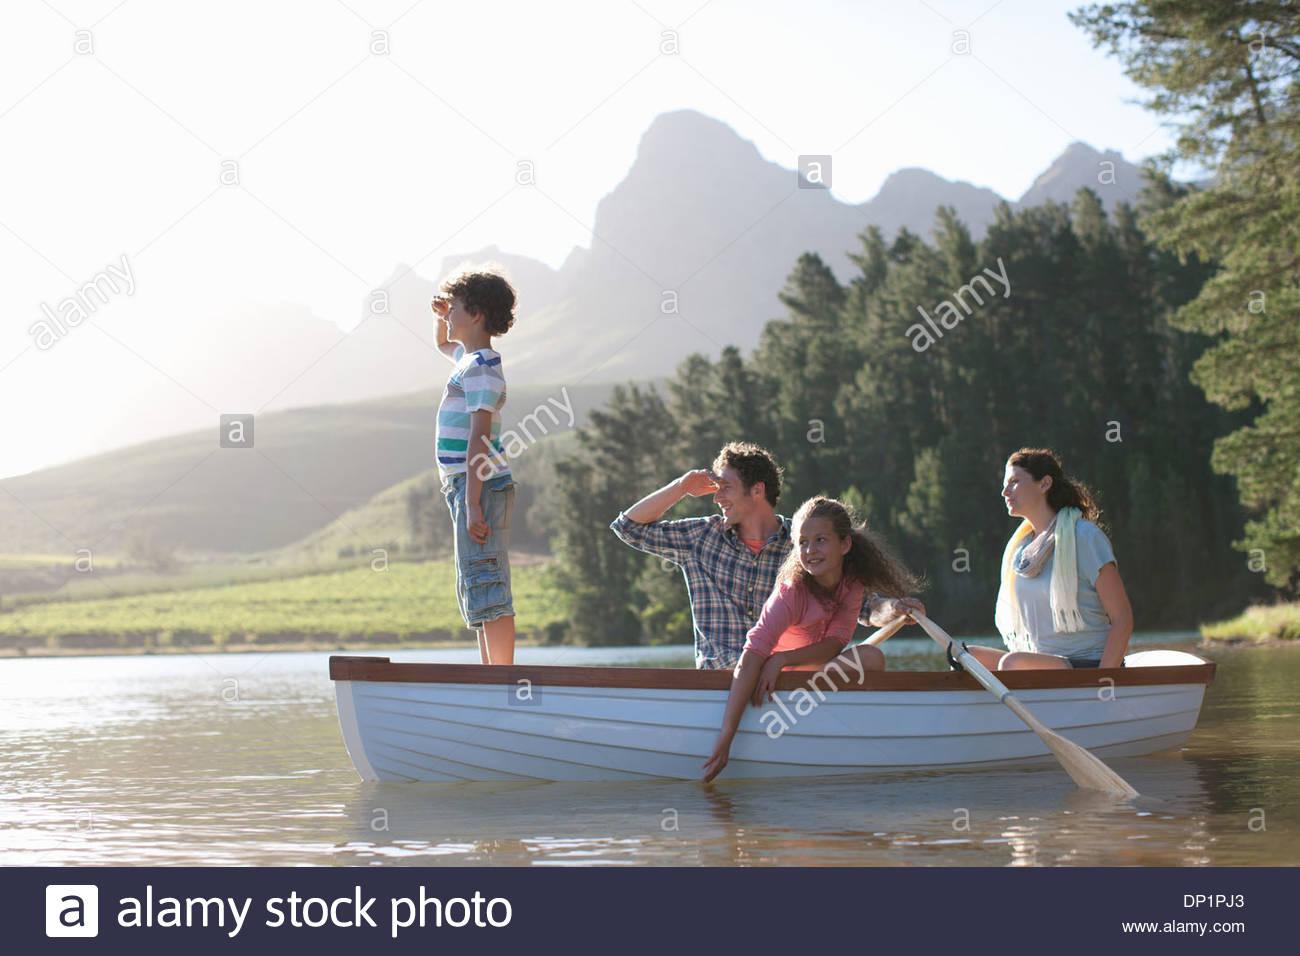 Family in rowboat on lake - Stock Image